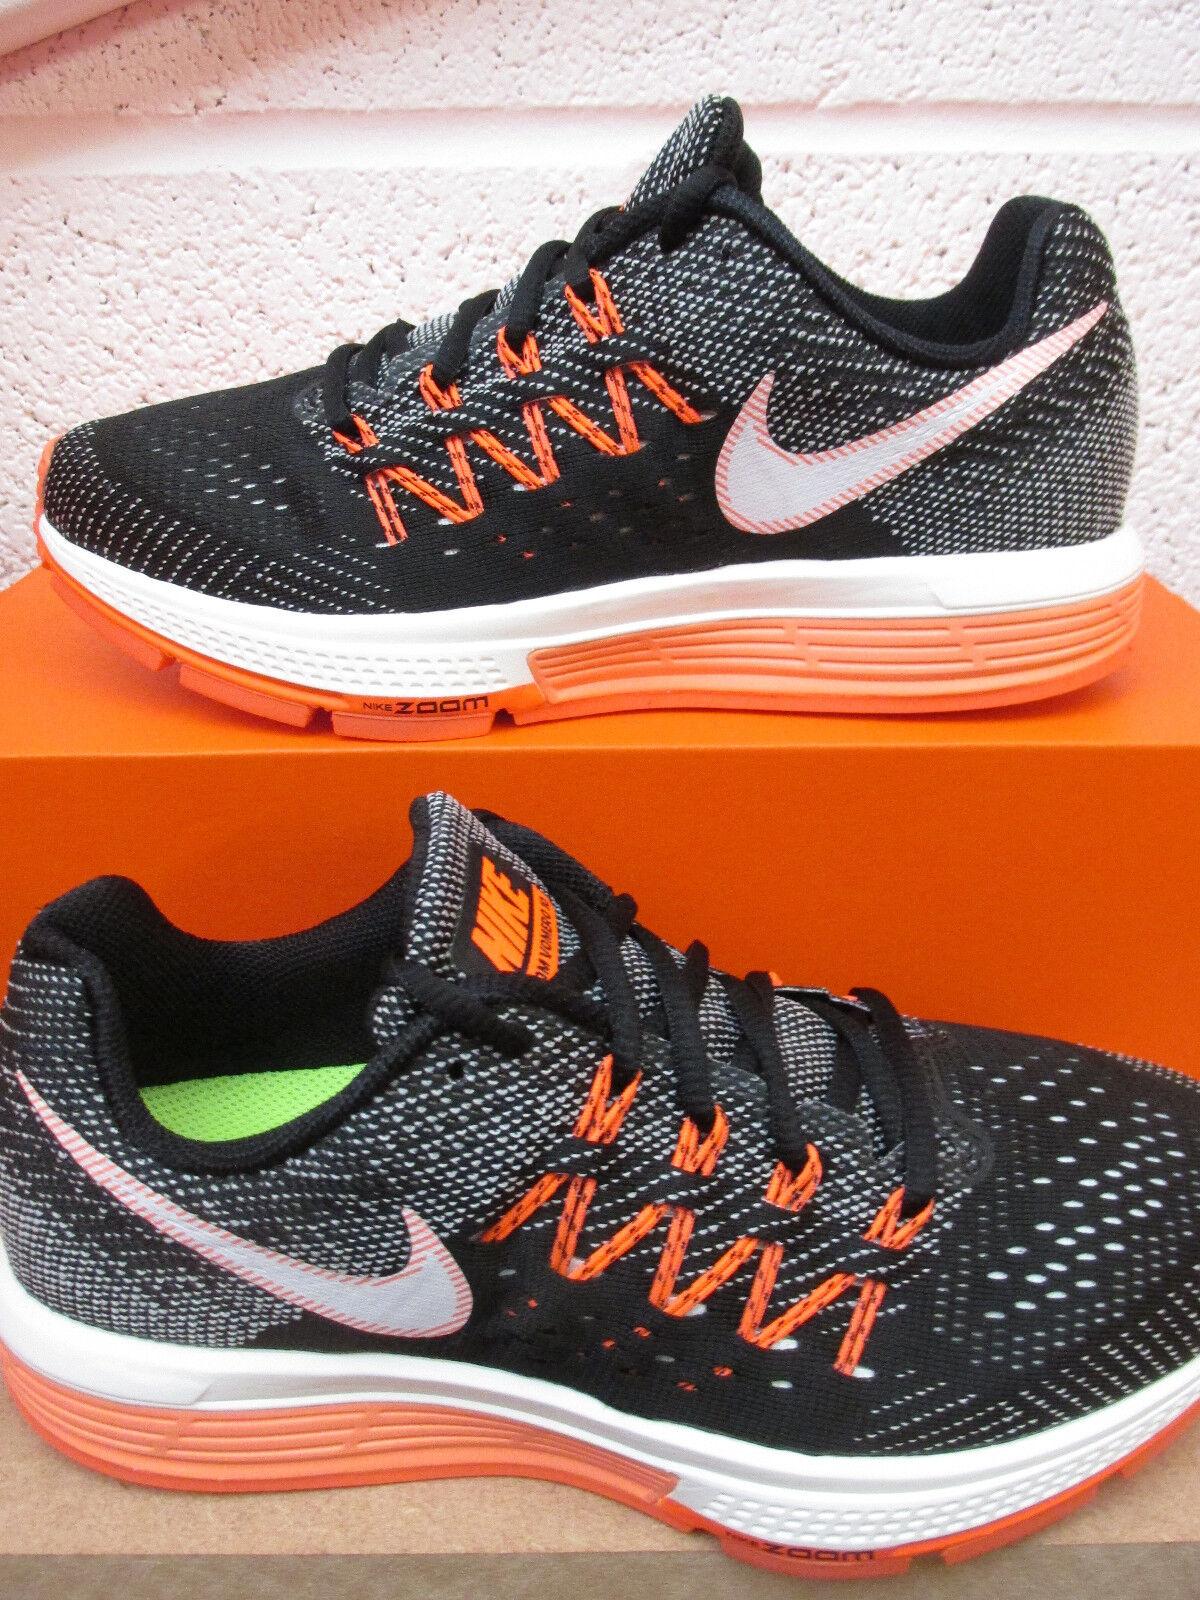 Nike Damen Luft 717441 Zoom Vomero 10 Laufschuhe 717441 Luft 008 Turnschuhe a97b57